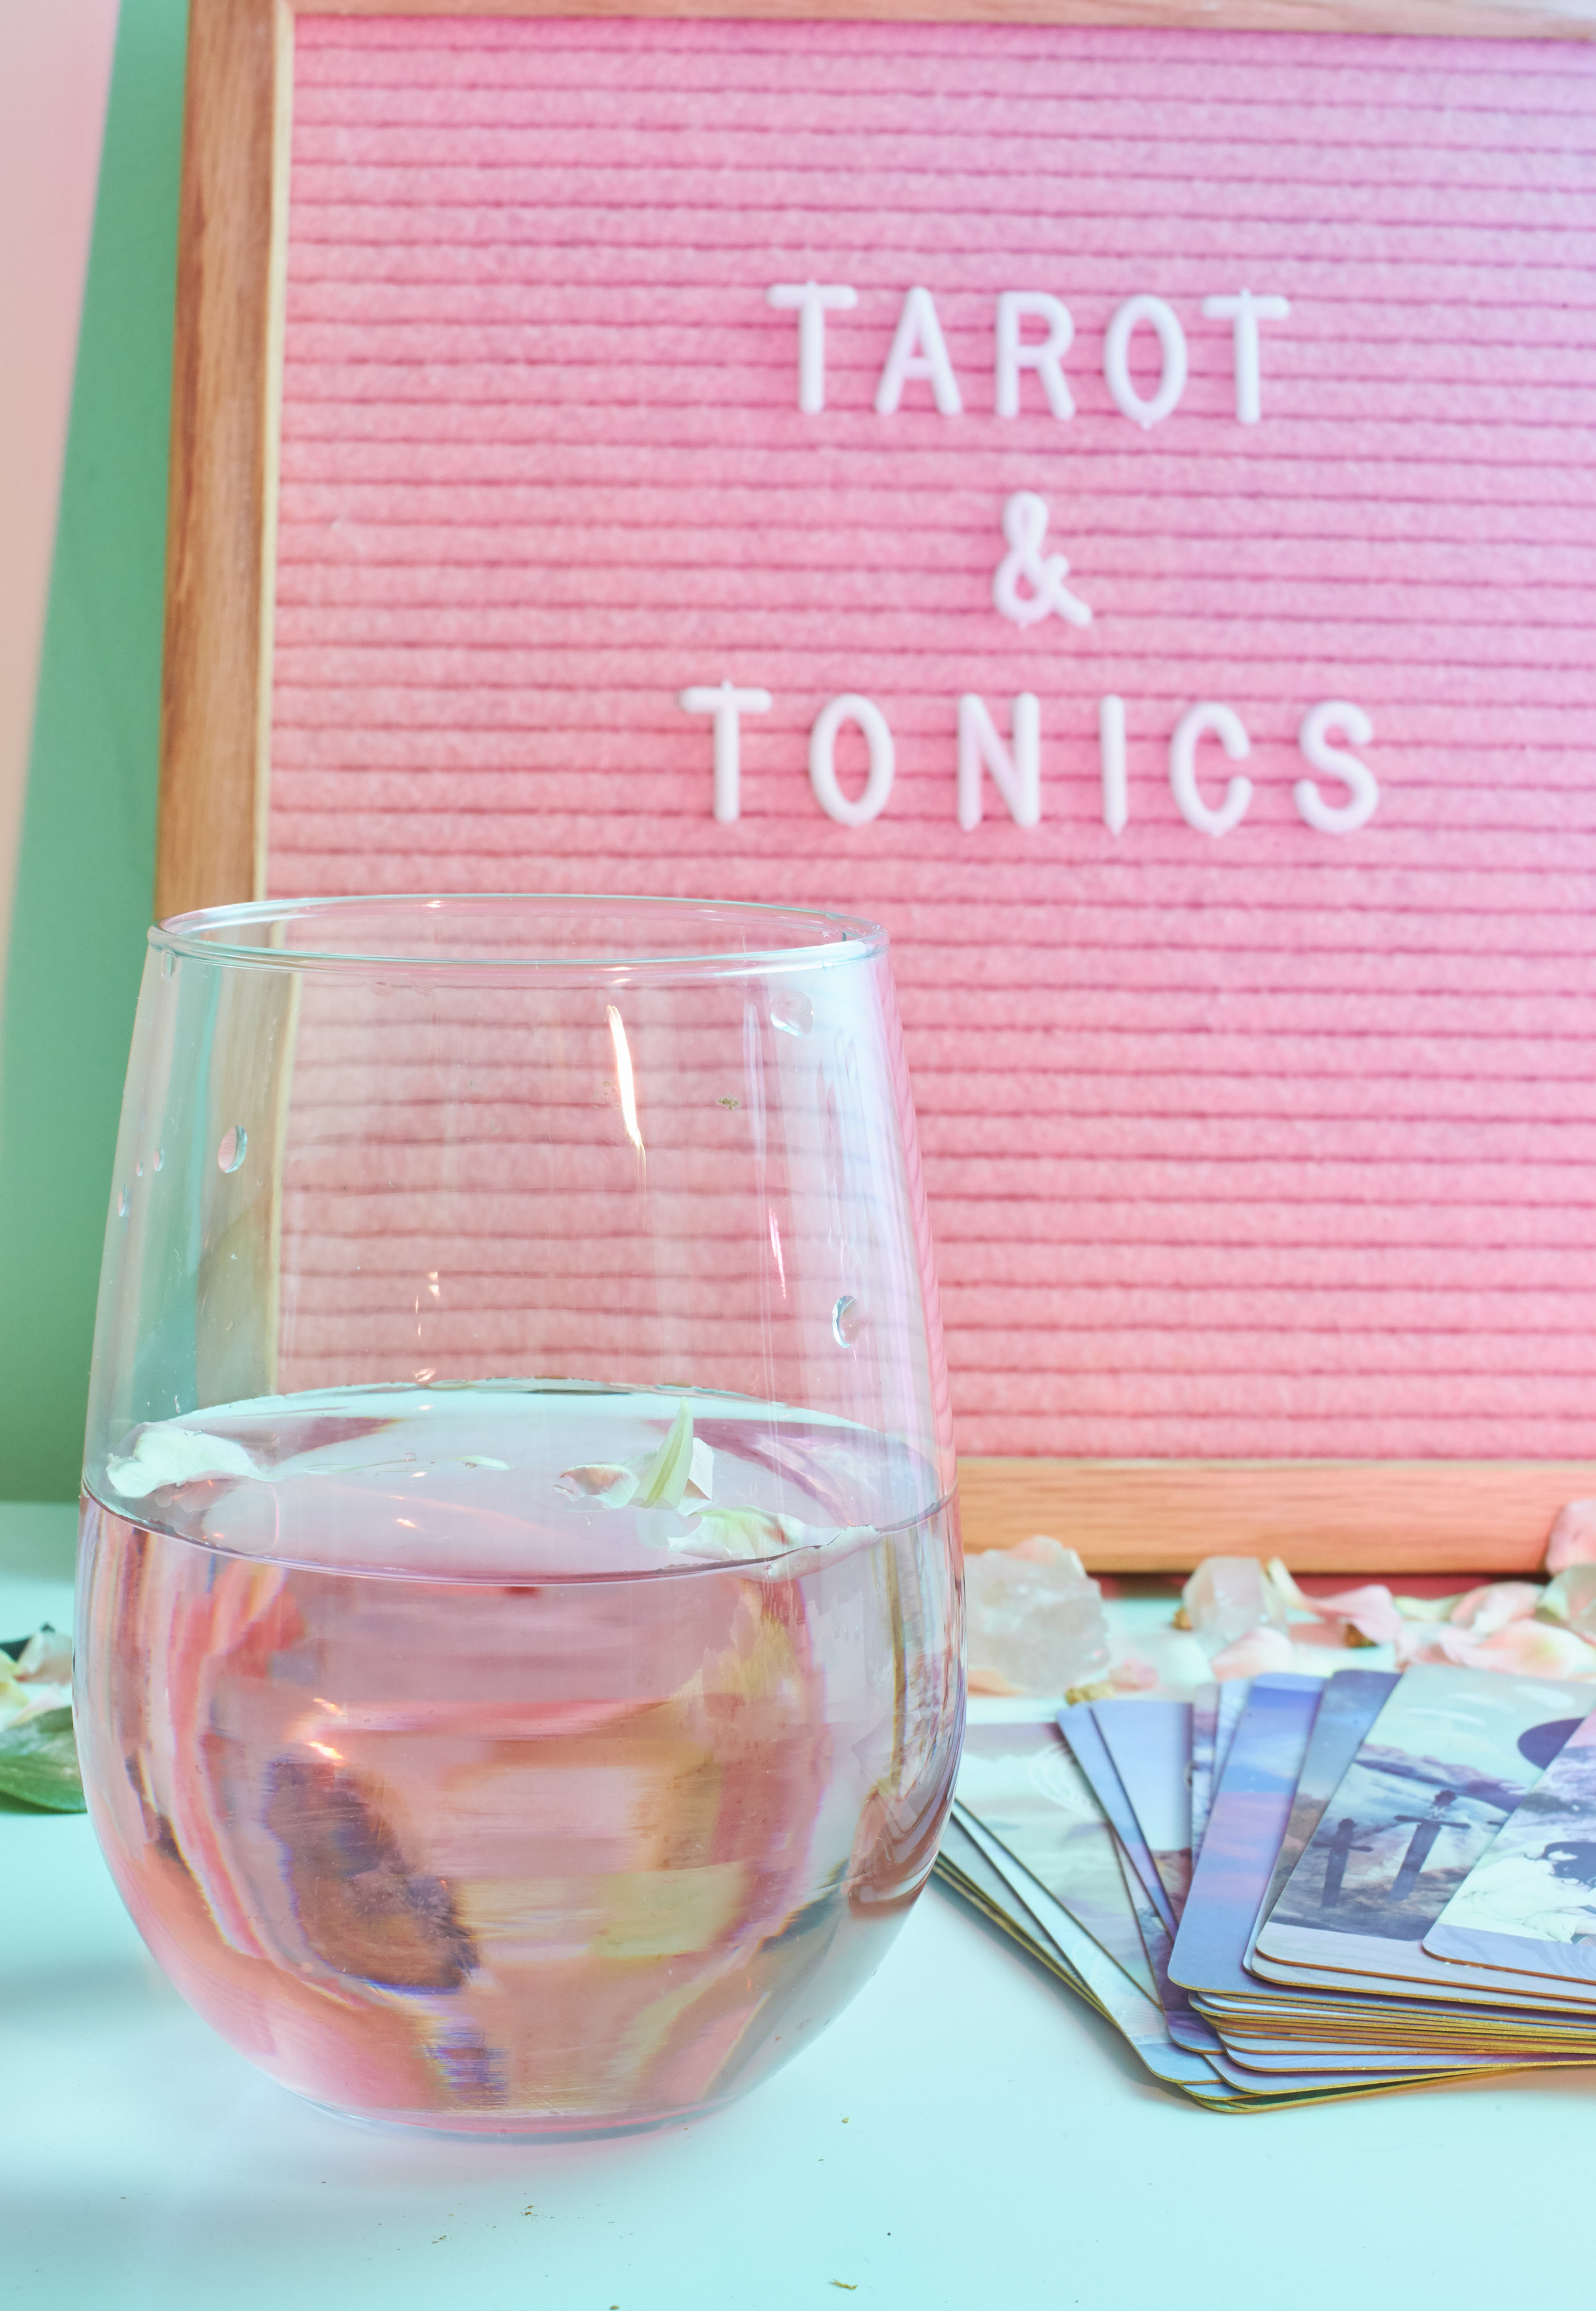 Tarot&TonicsIMG_1810.jpg